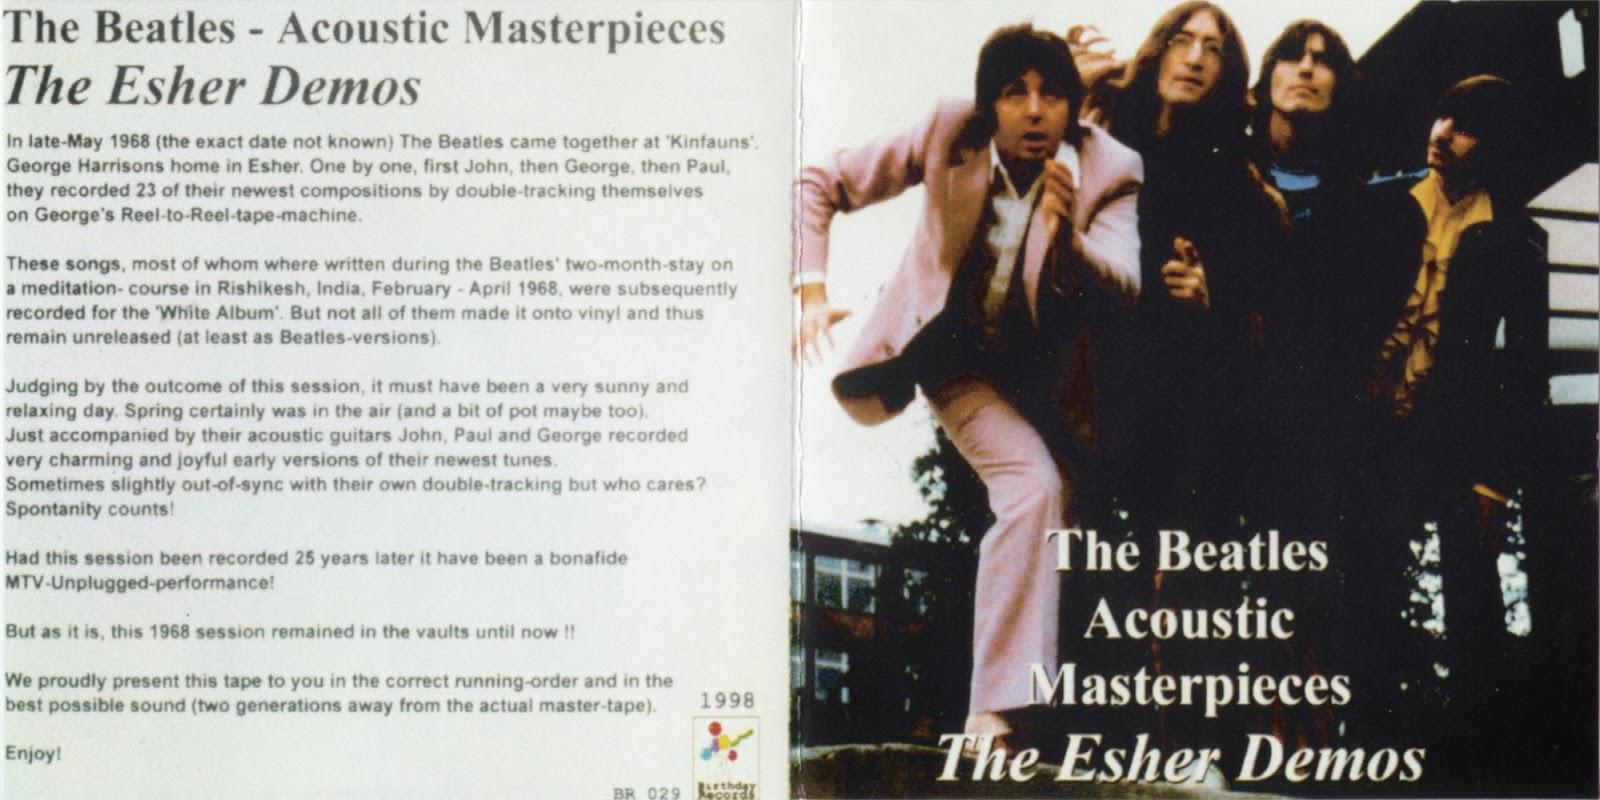 T U B E : The Beatles - 1968 The Esher Demos (STU/FLAC)